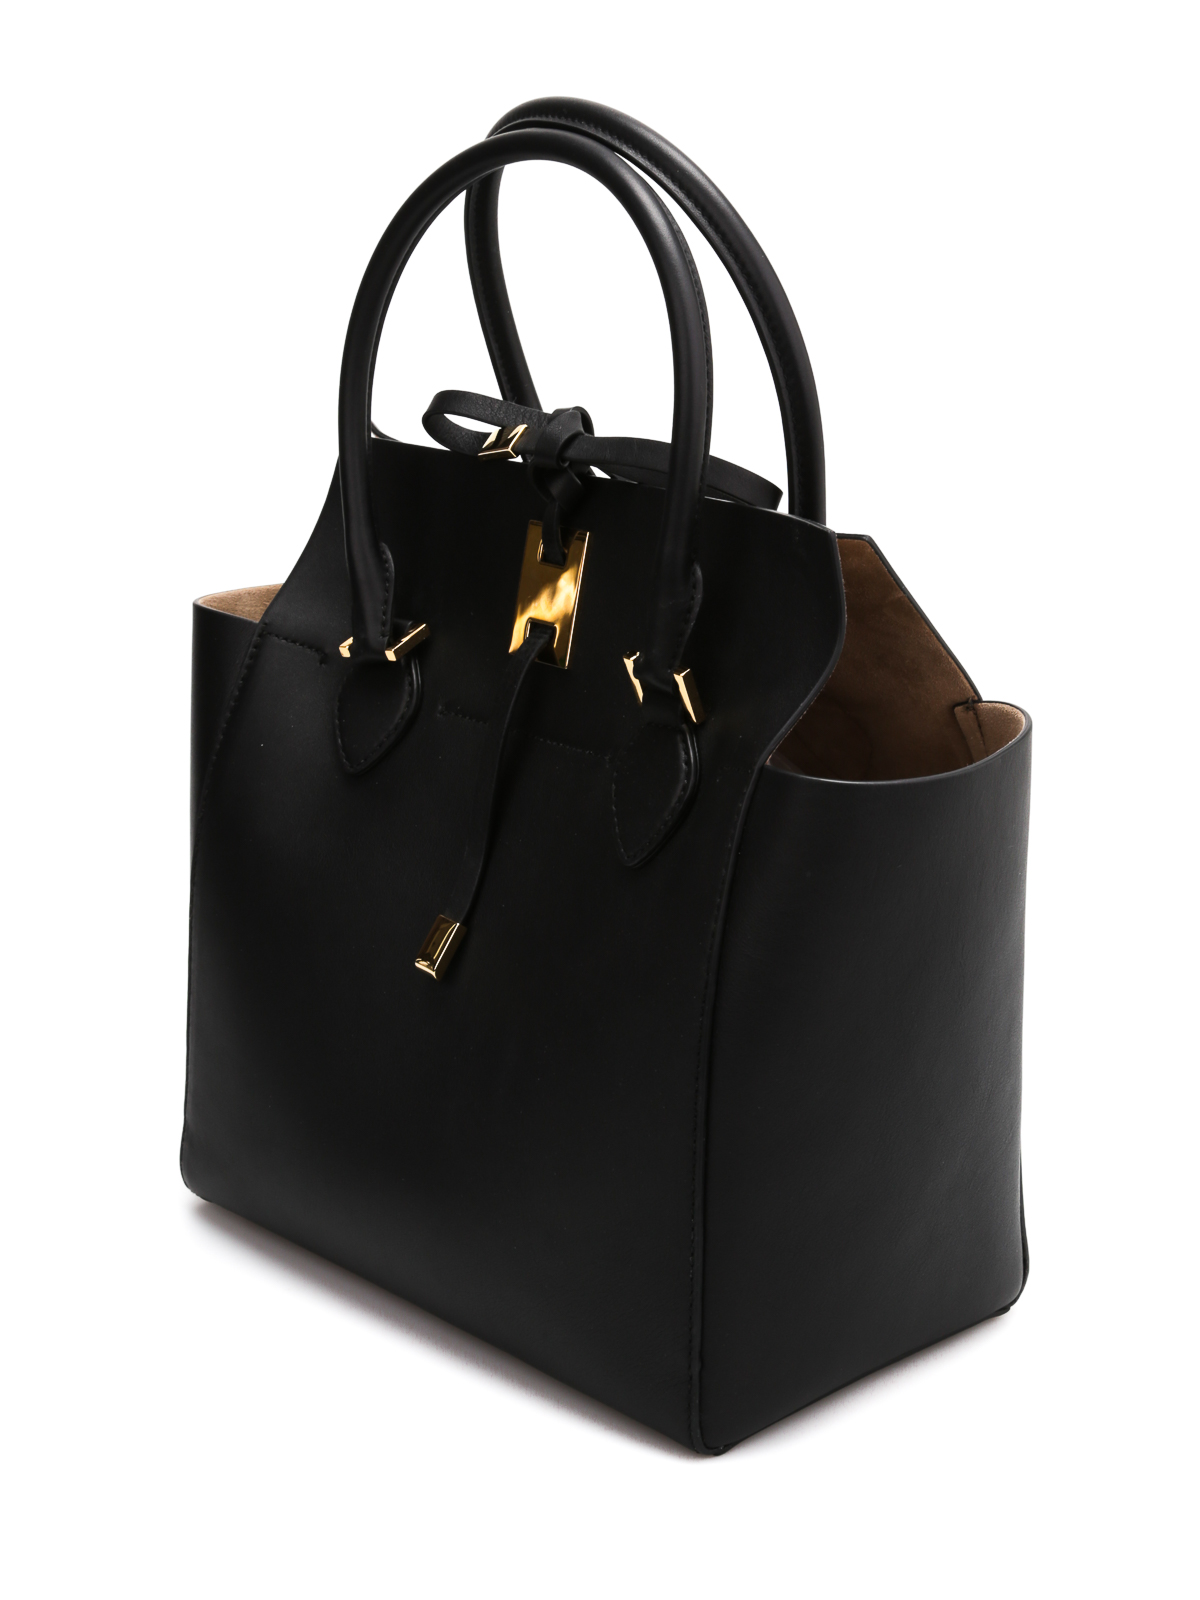 667cd684c75515 Michael Kors - Miranda Medium tote - totes bags - 31F4GMDT6L BLACK